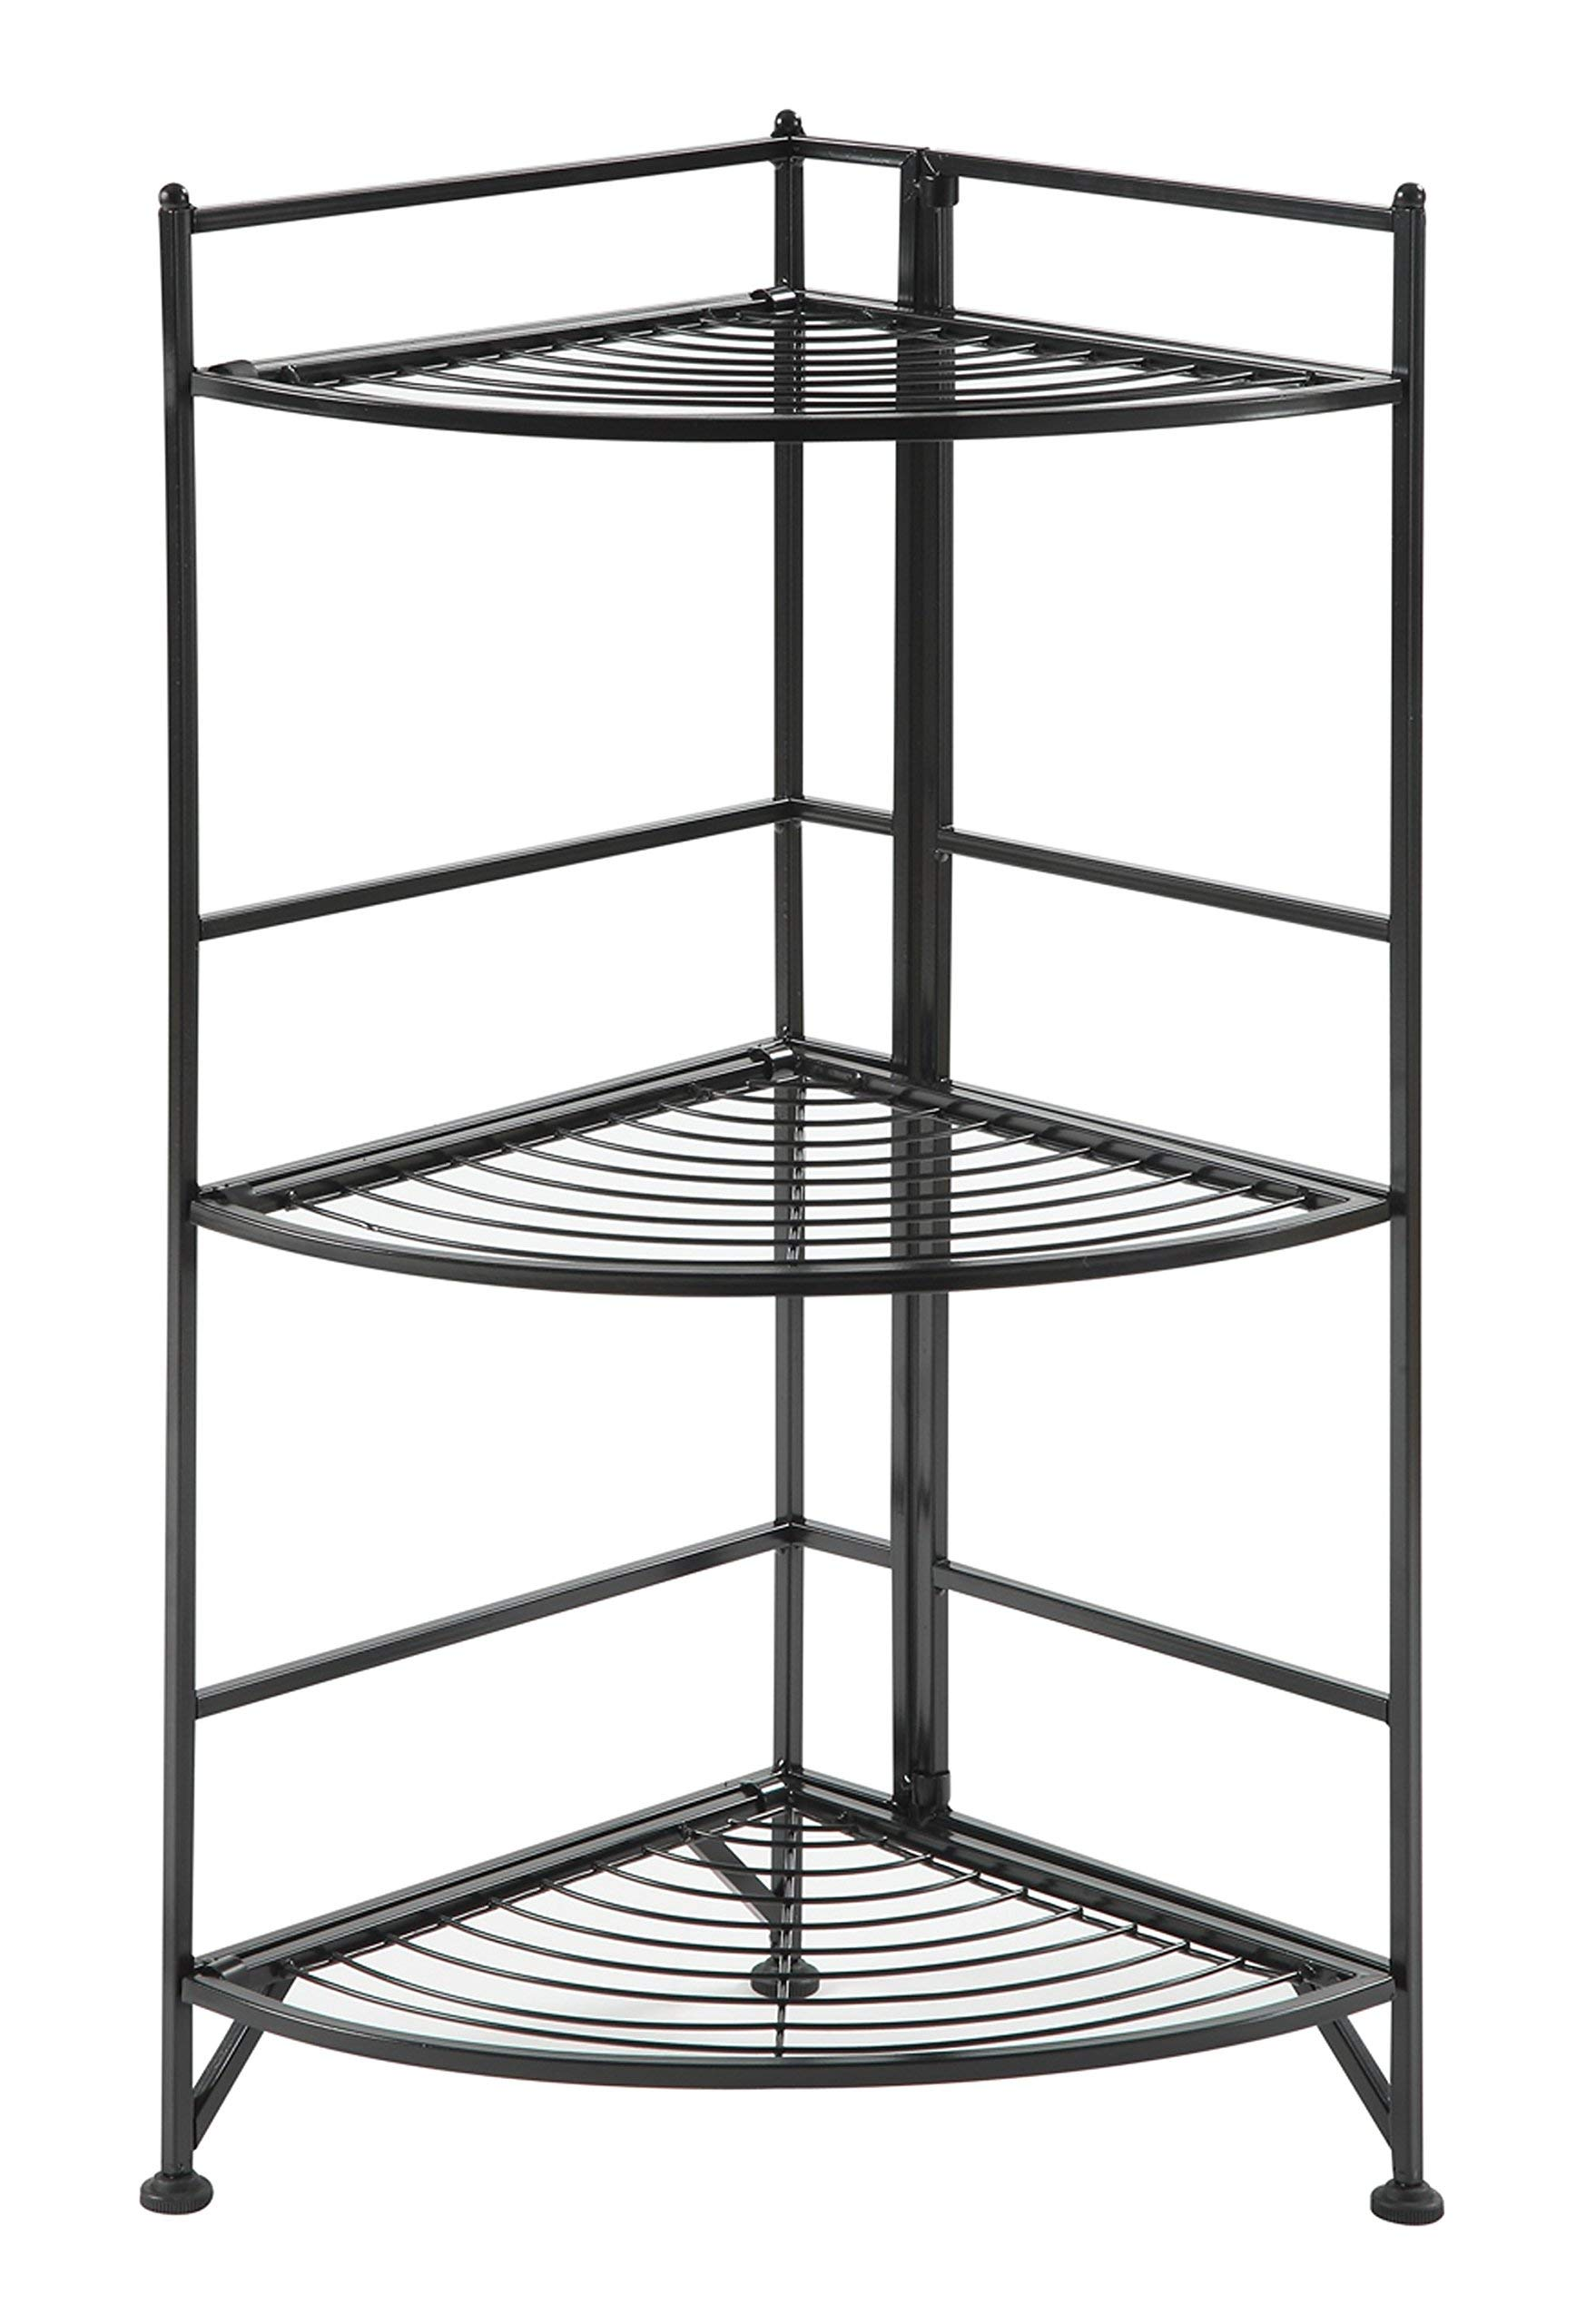 Convenience Concepts 8022B Designs2Go X-Tra Storage 3-Tier Folding Metal Corner Shelf, Black by Convenience Concepts